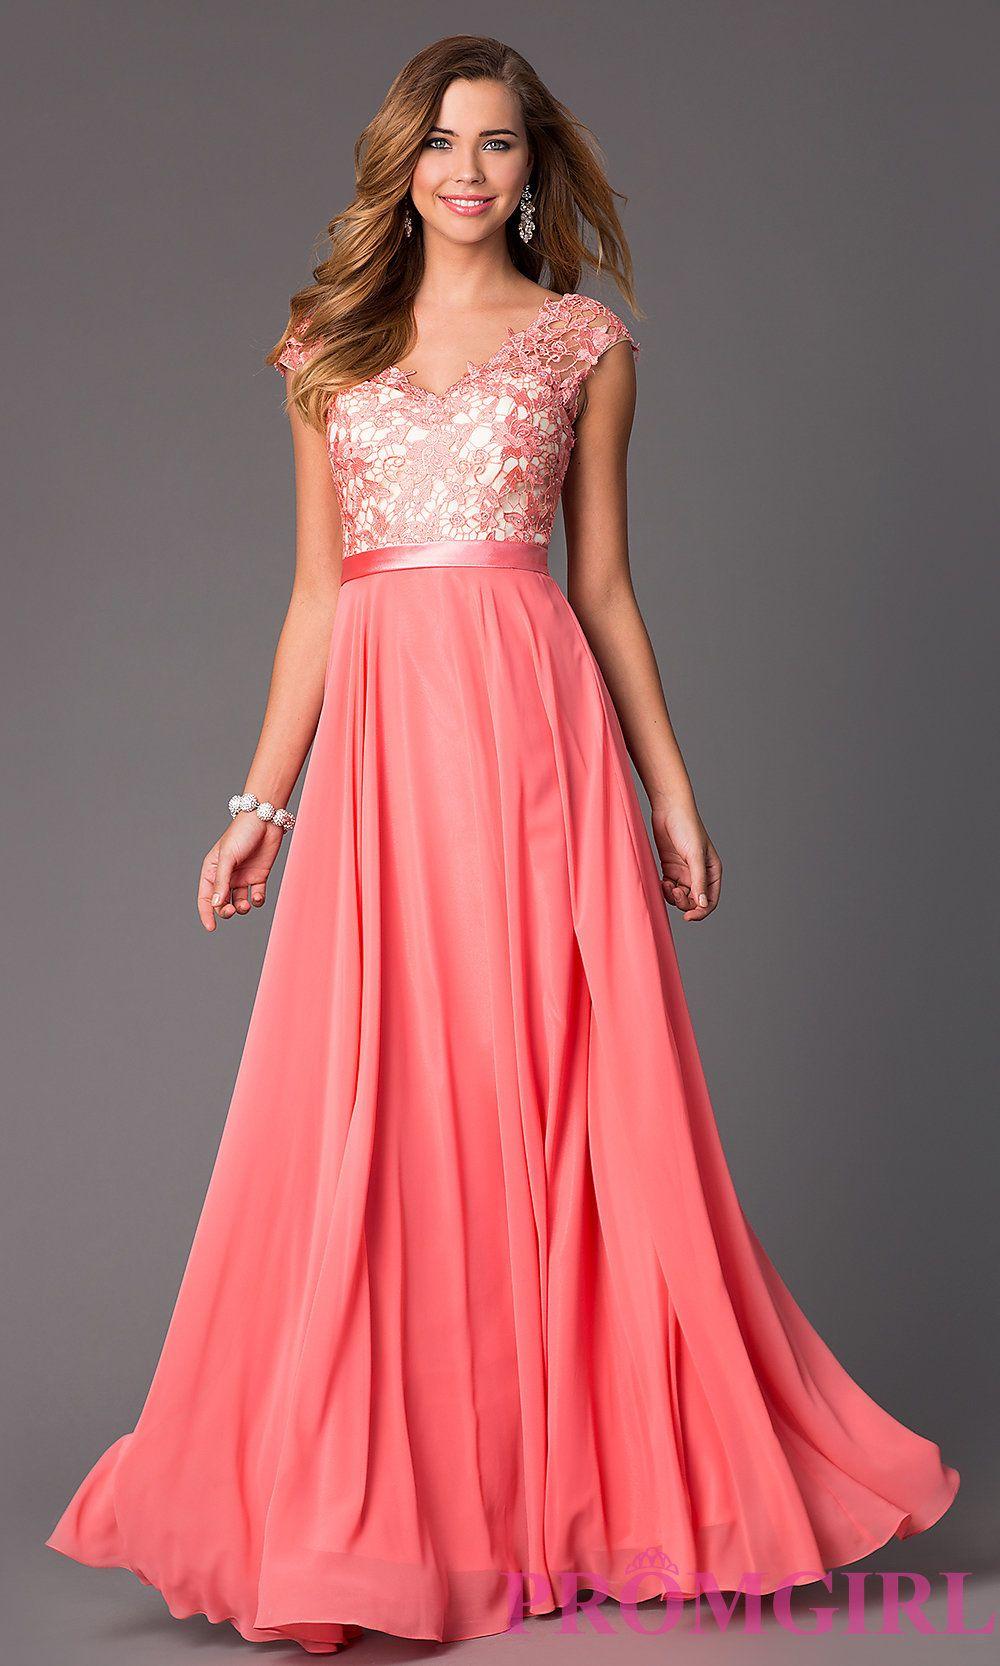 Modest cap sleeve V-neck pink Prom dress   dolls   Pinterest   Prom ...